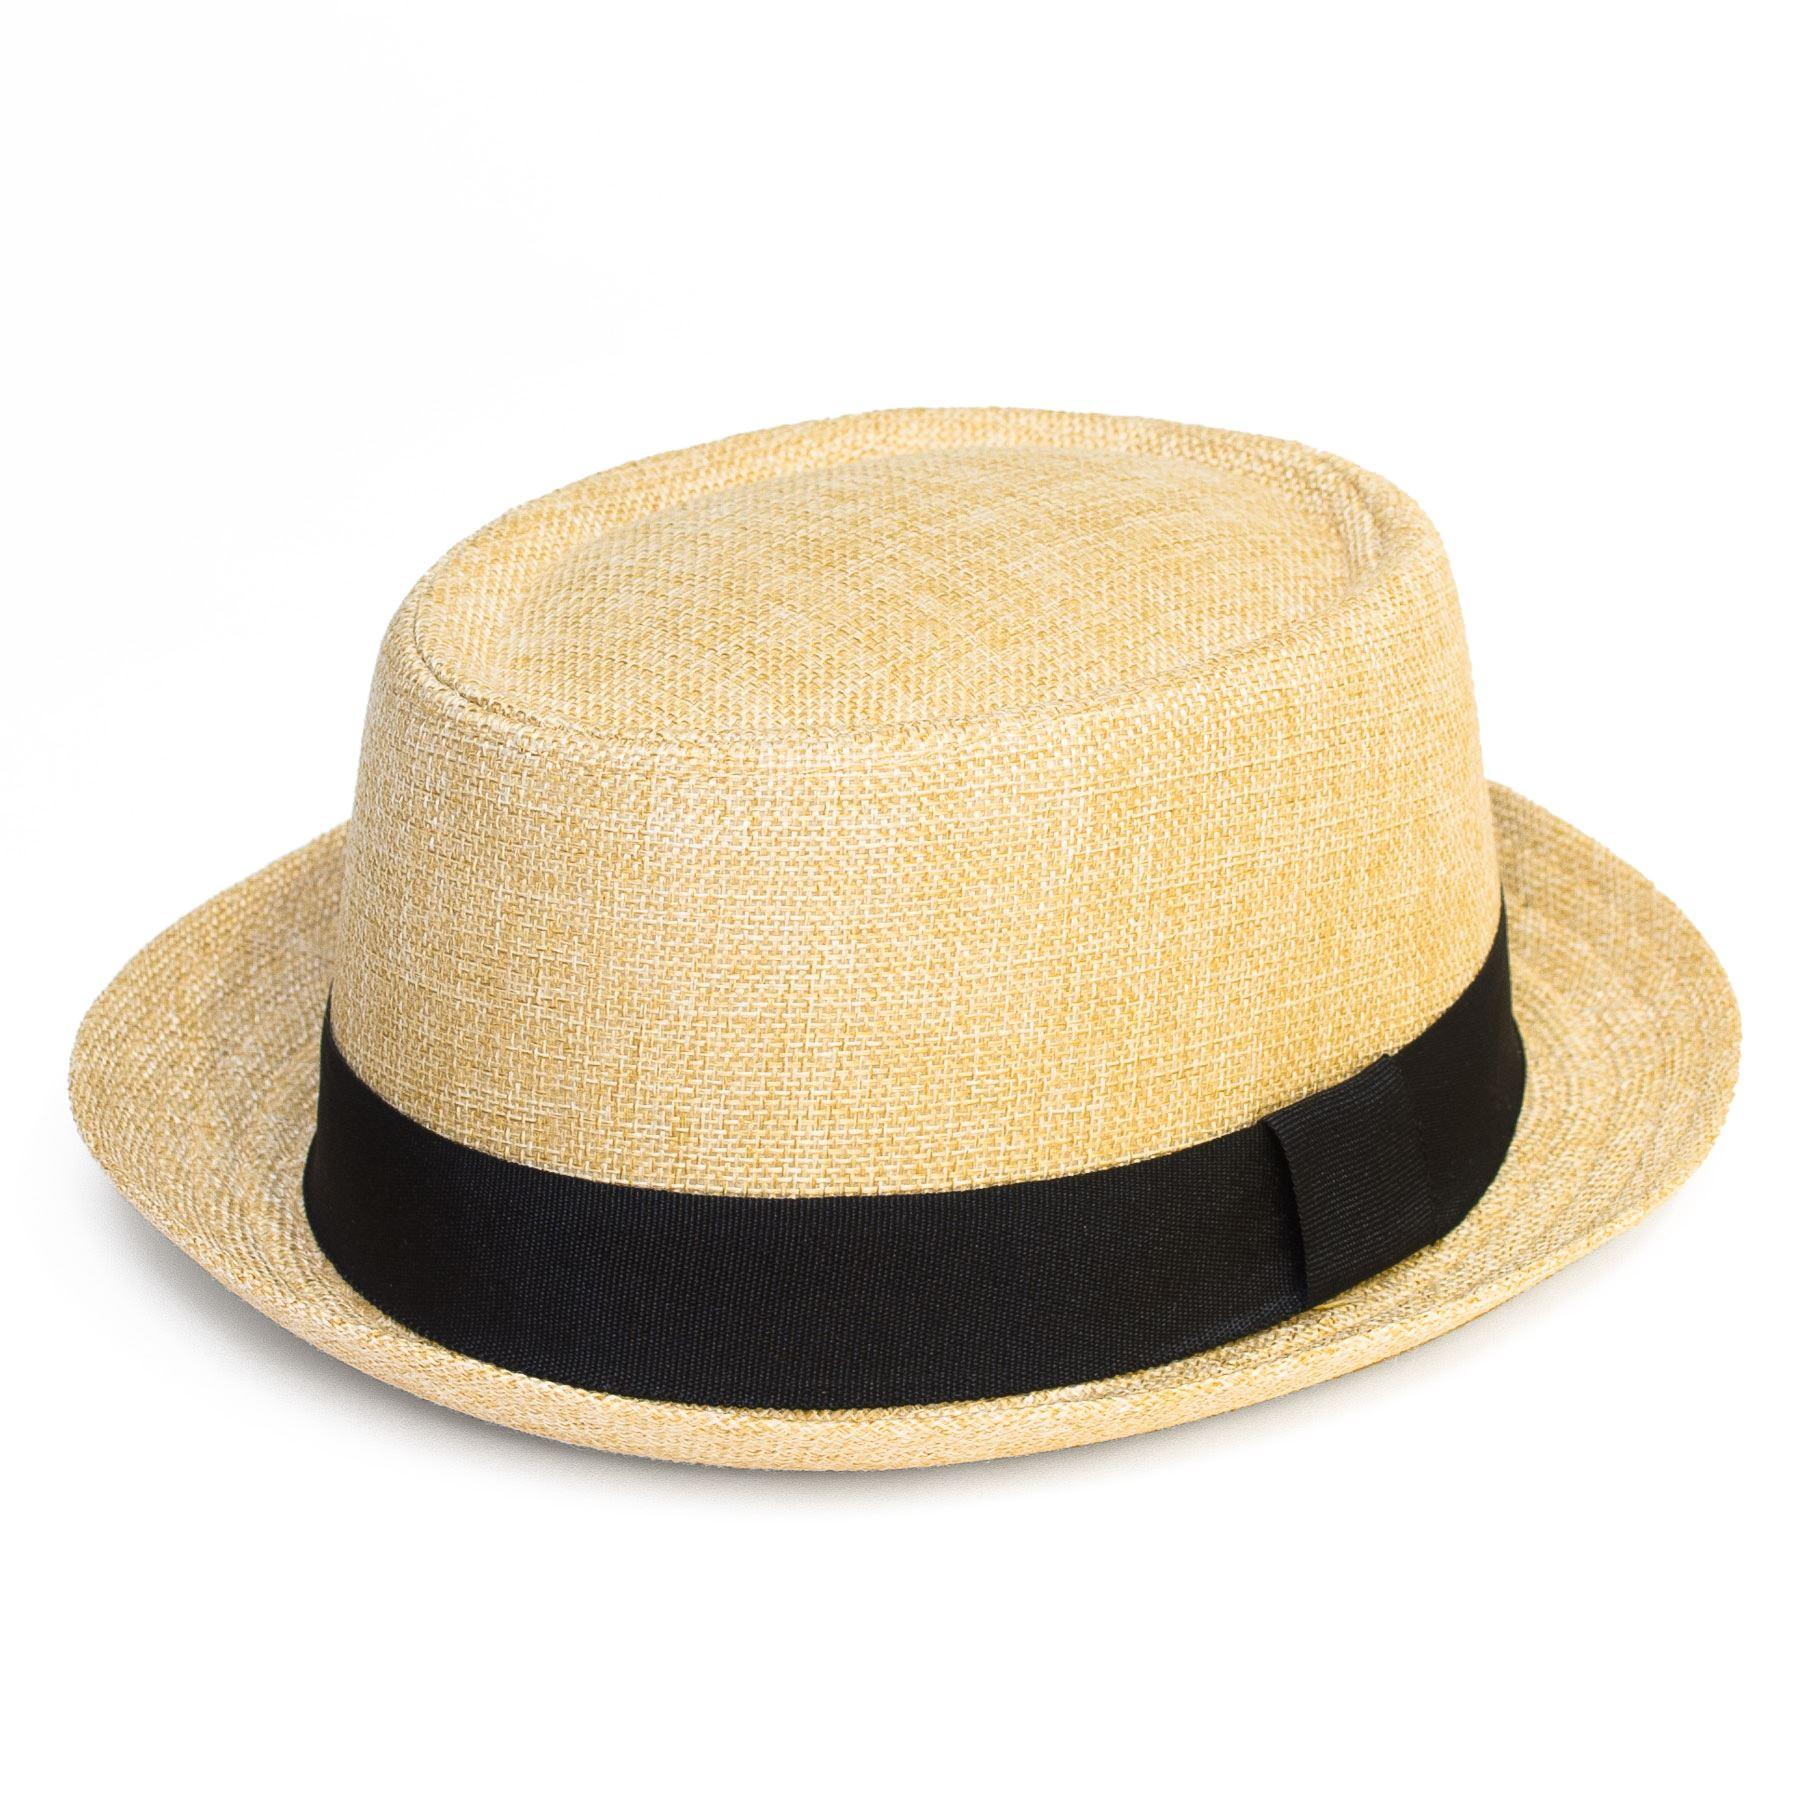 Pork Pie Hat with Black Grosgrain Band